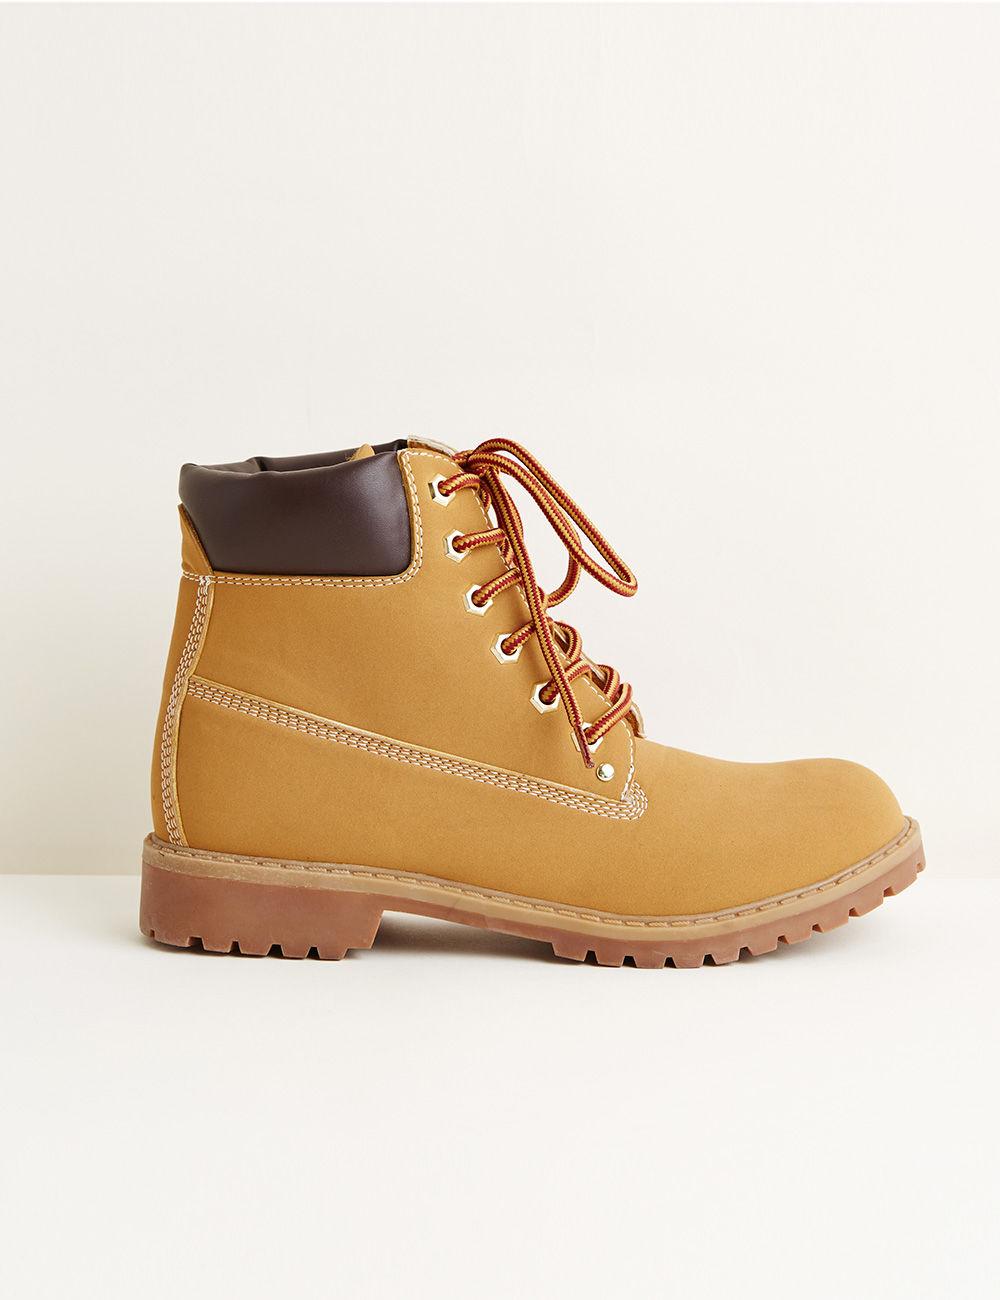 Rangers simili cuir beiges - Jennyfer e-shop